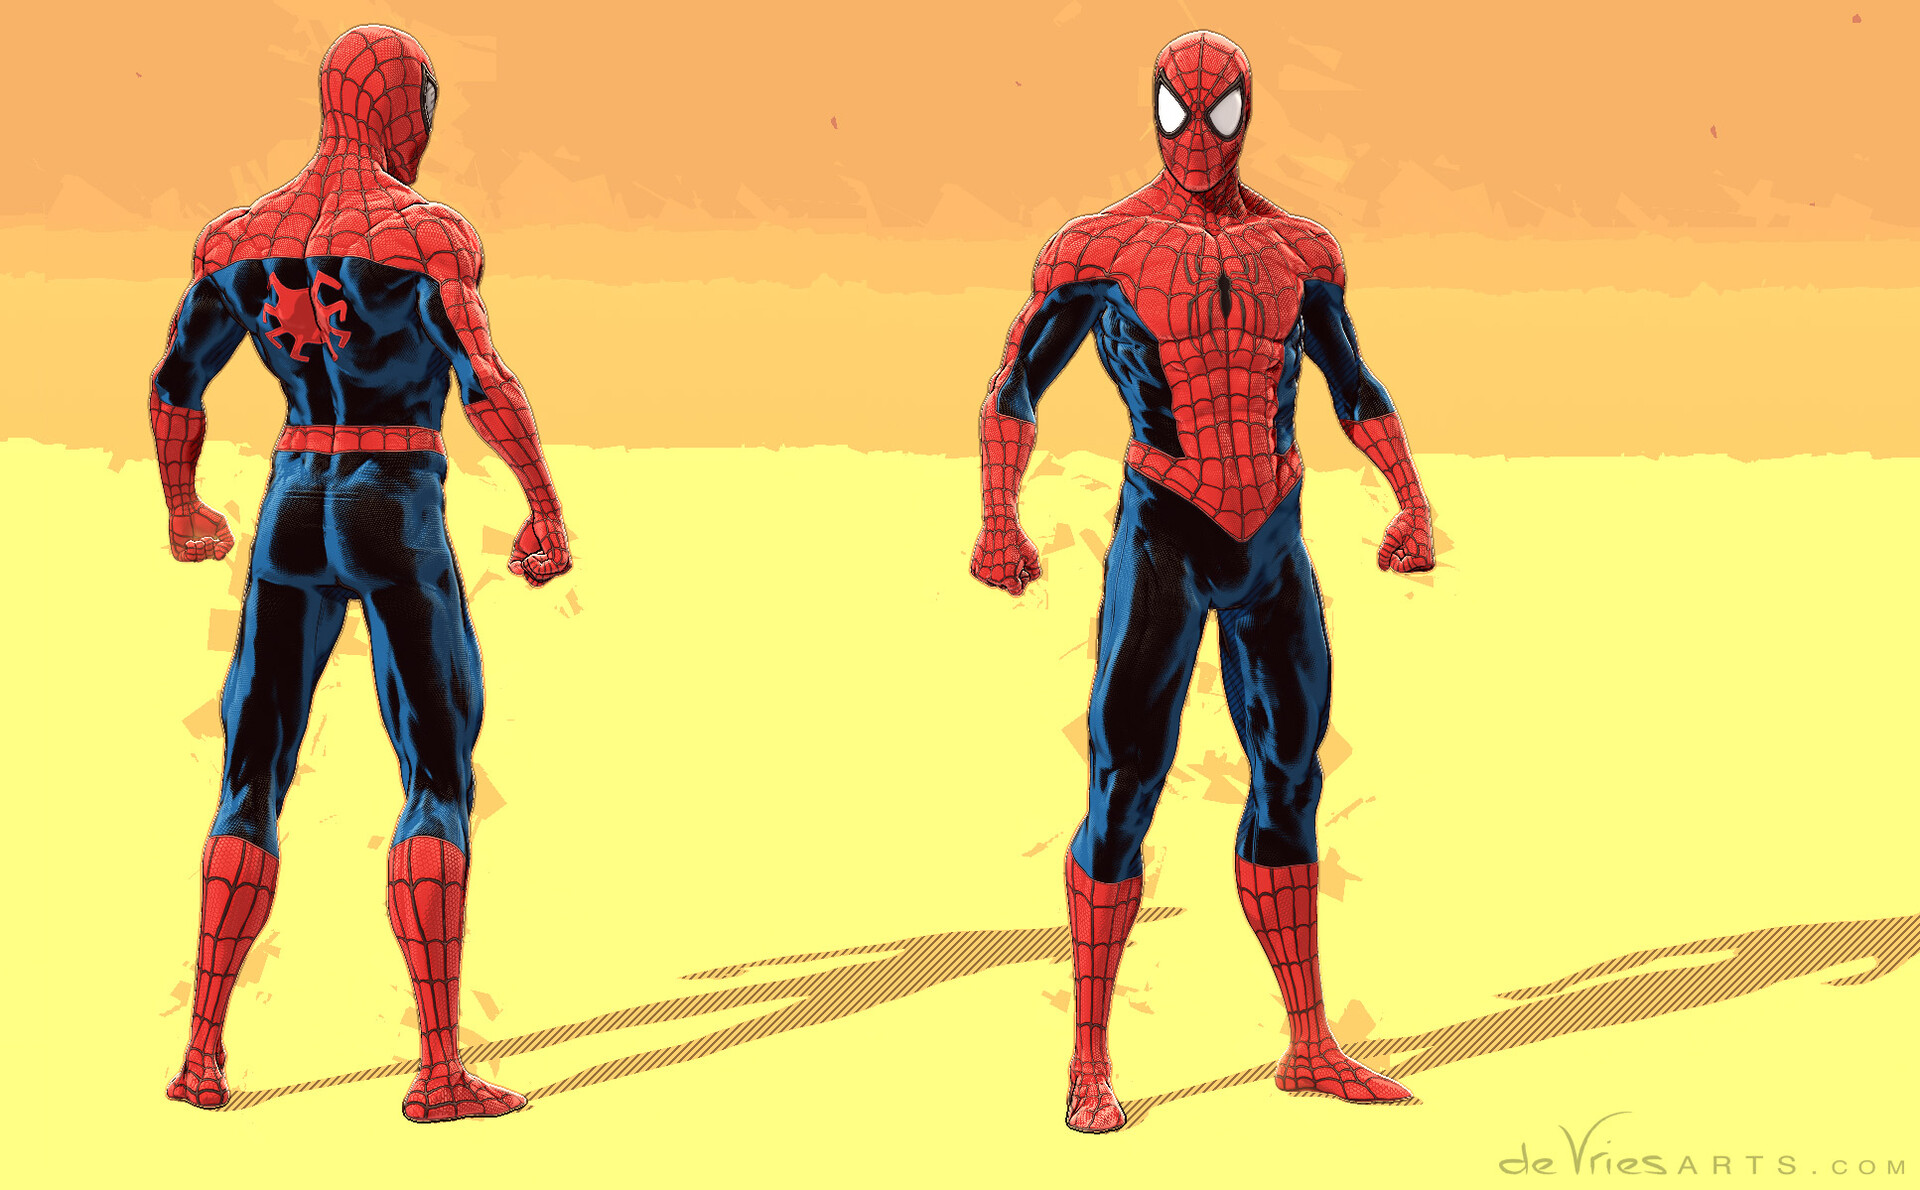 Thijs de vries standing spiderman thijsdevries devriesarts